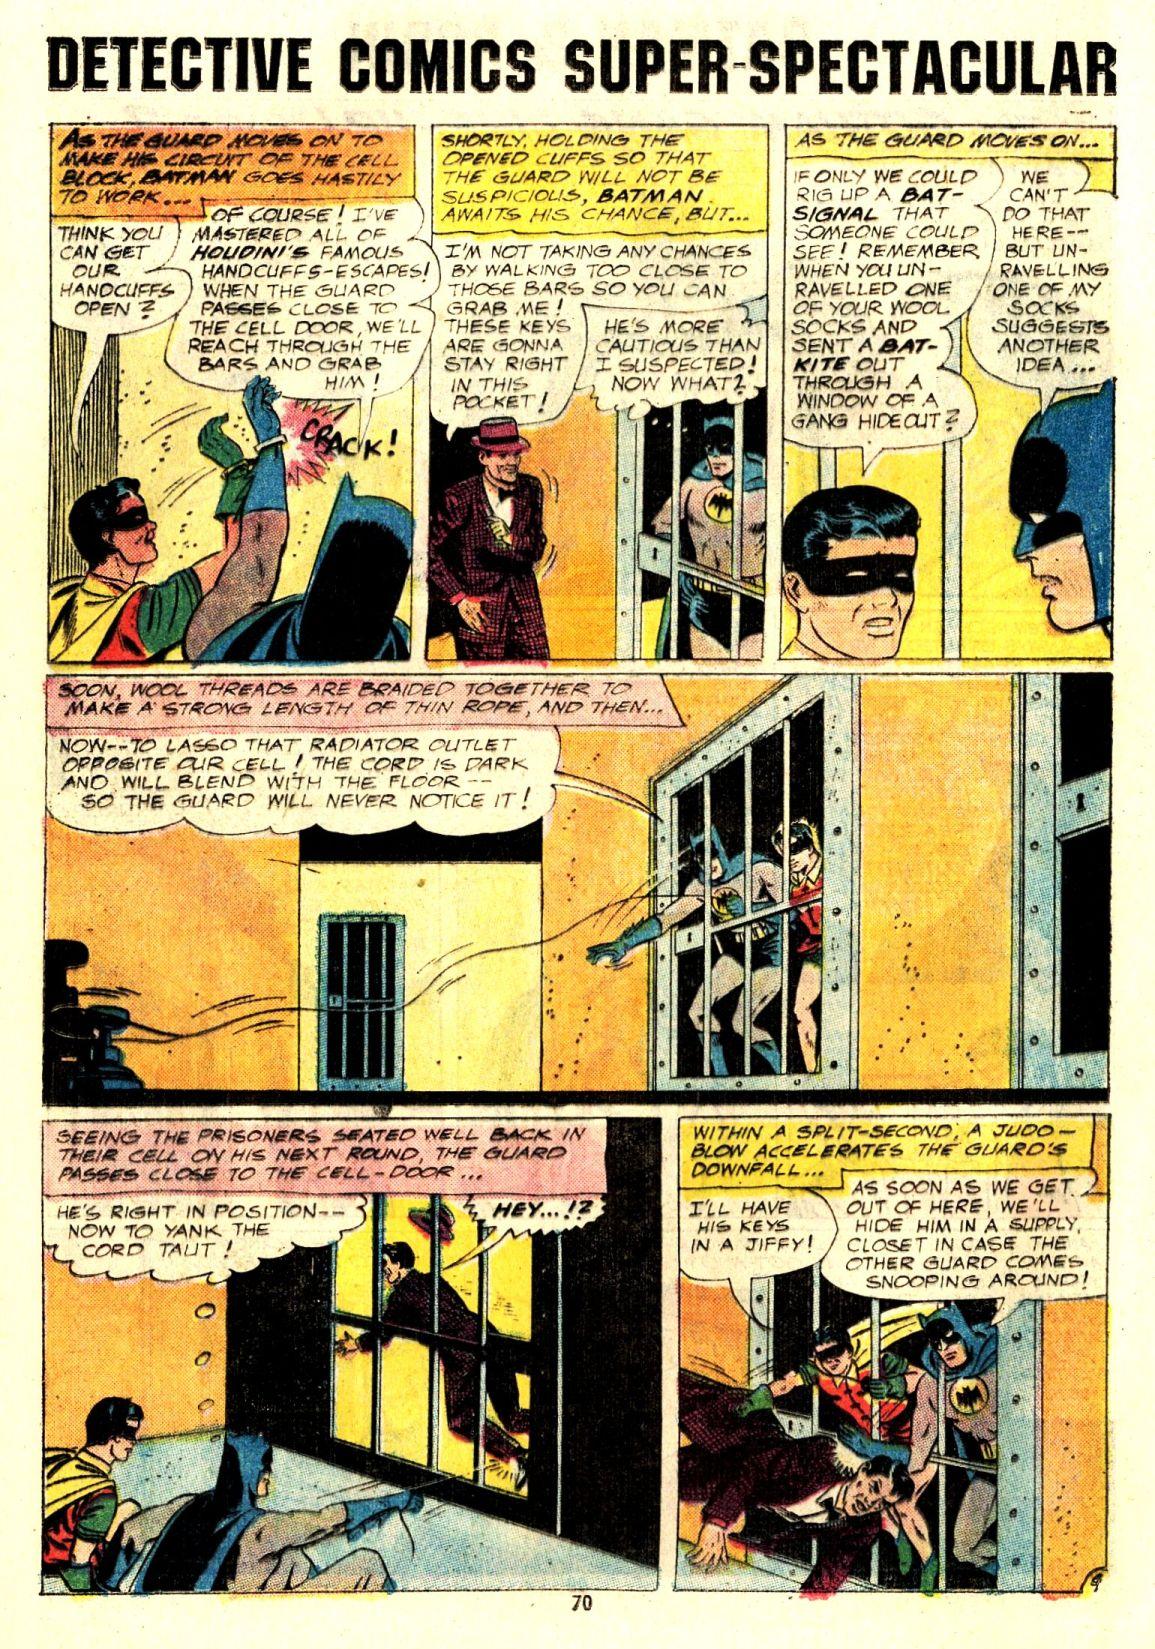 Detective Comics (1937) 438 Page 70